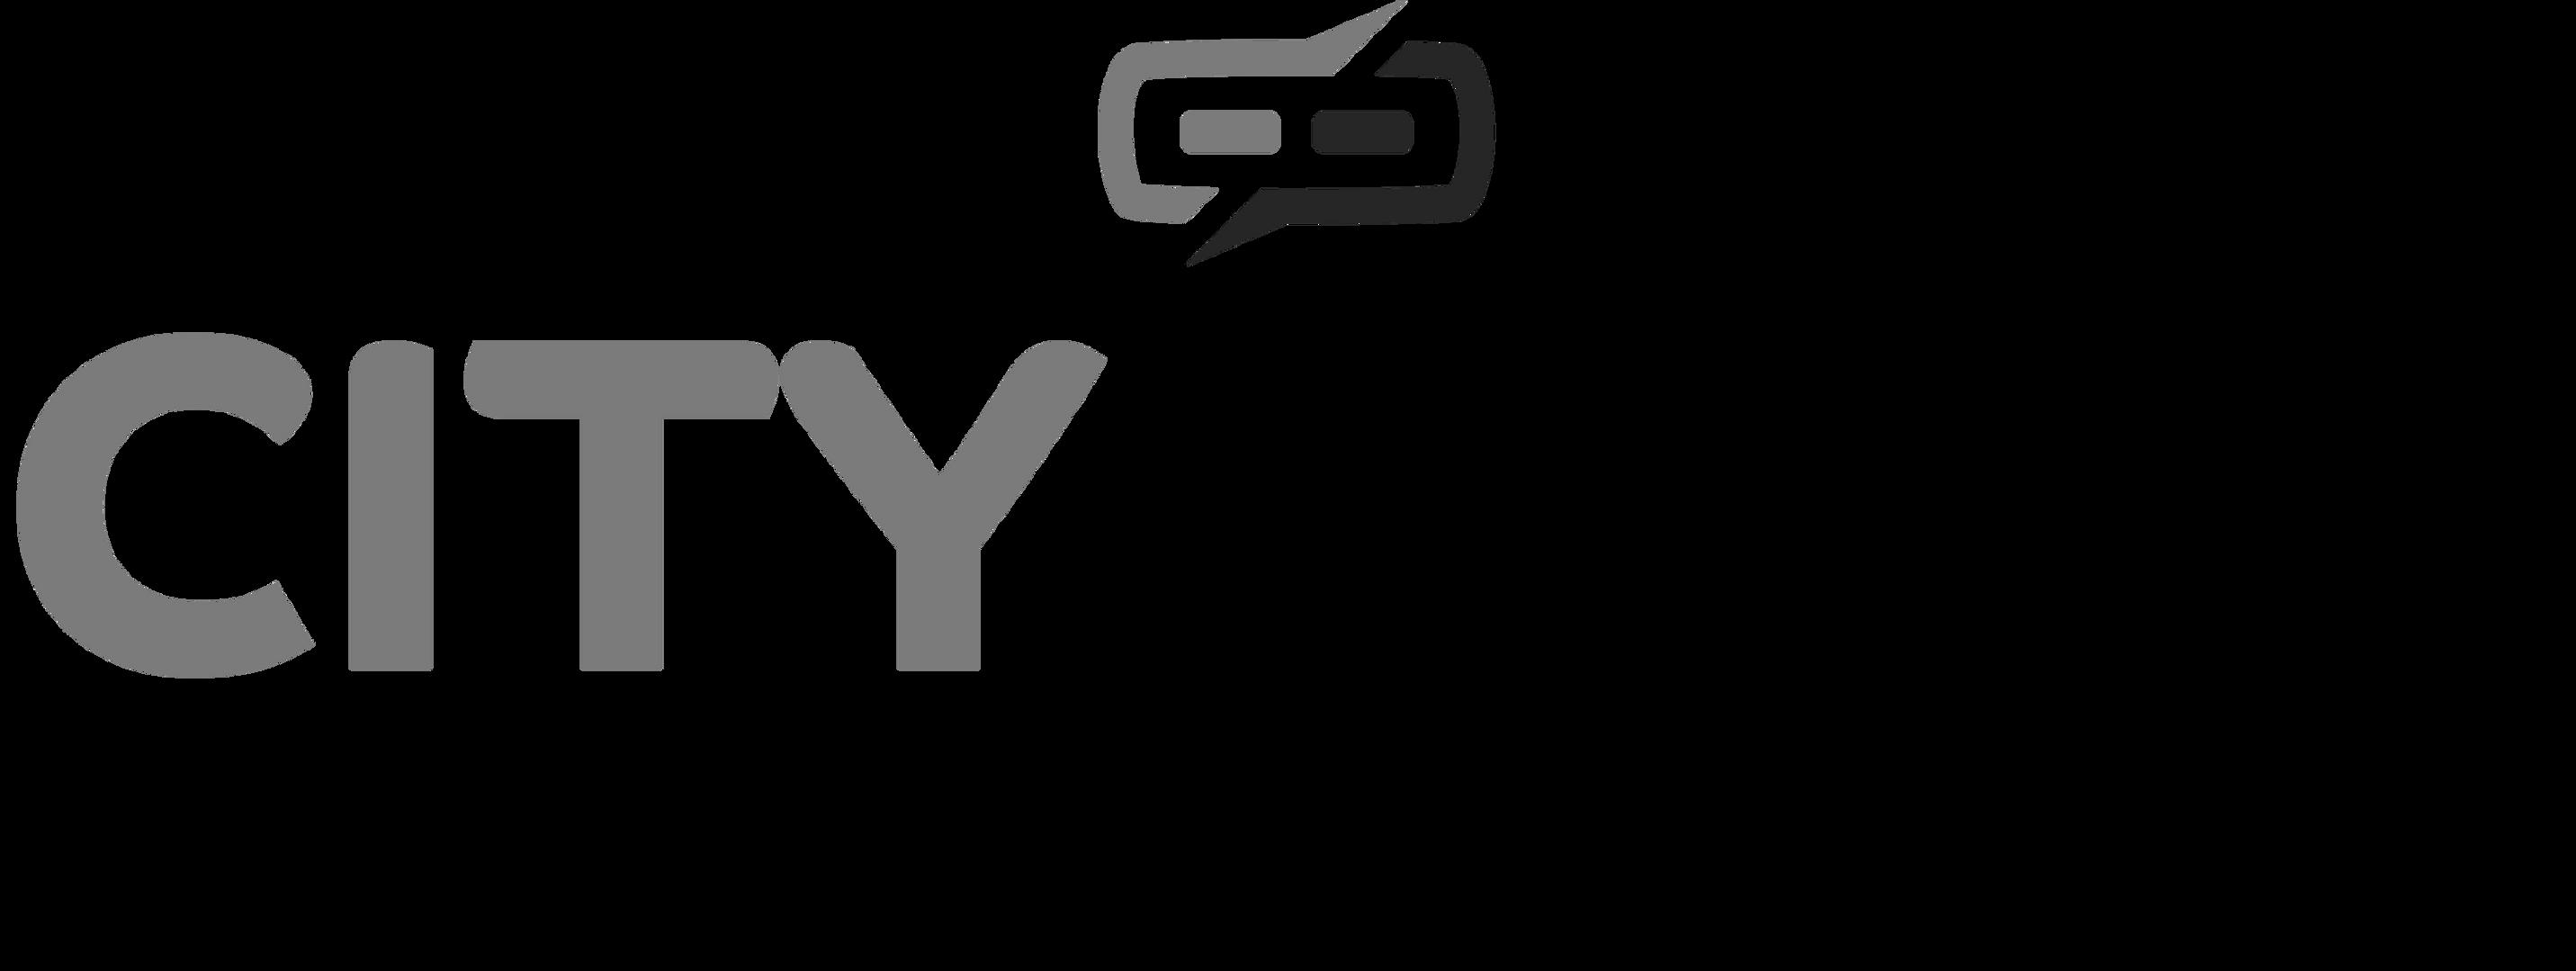 City%20Rush_logo_edited.png